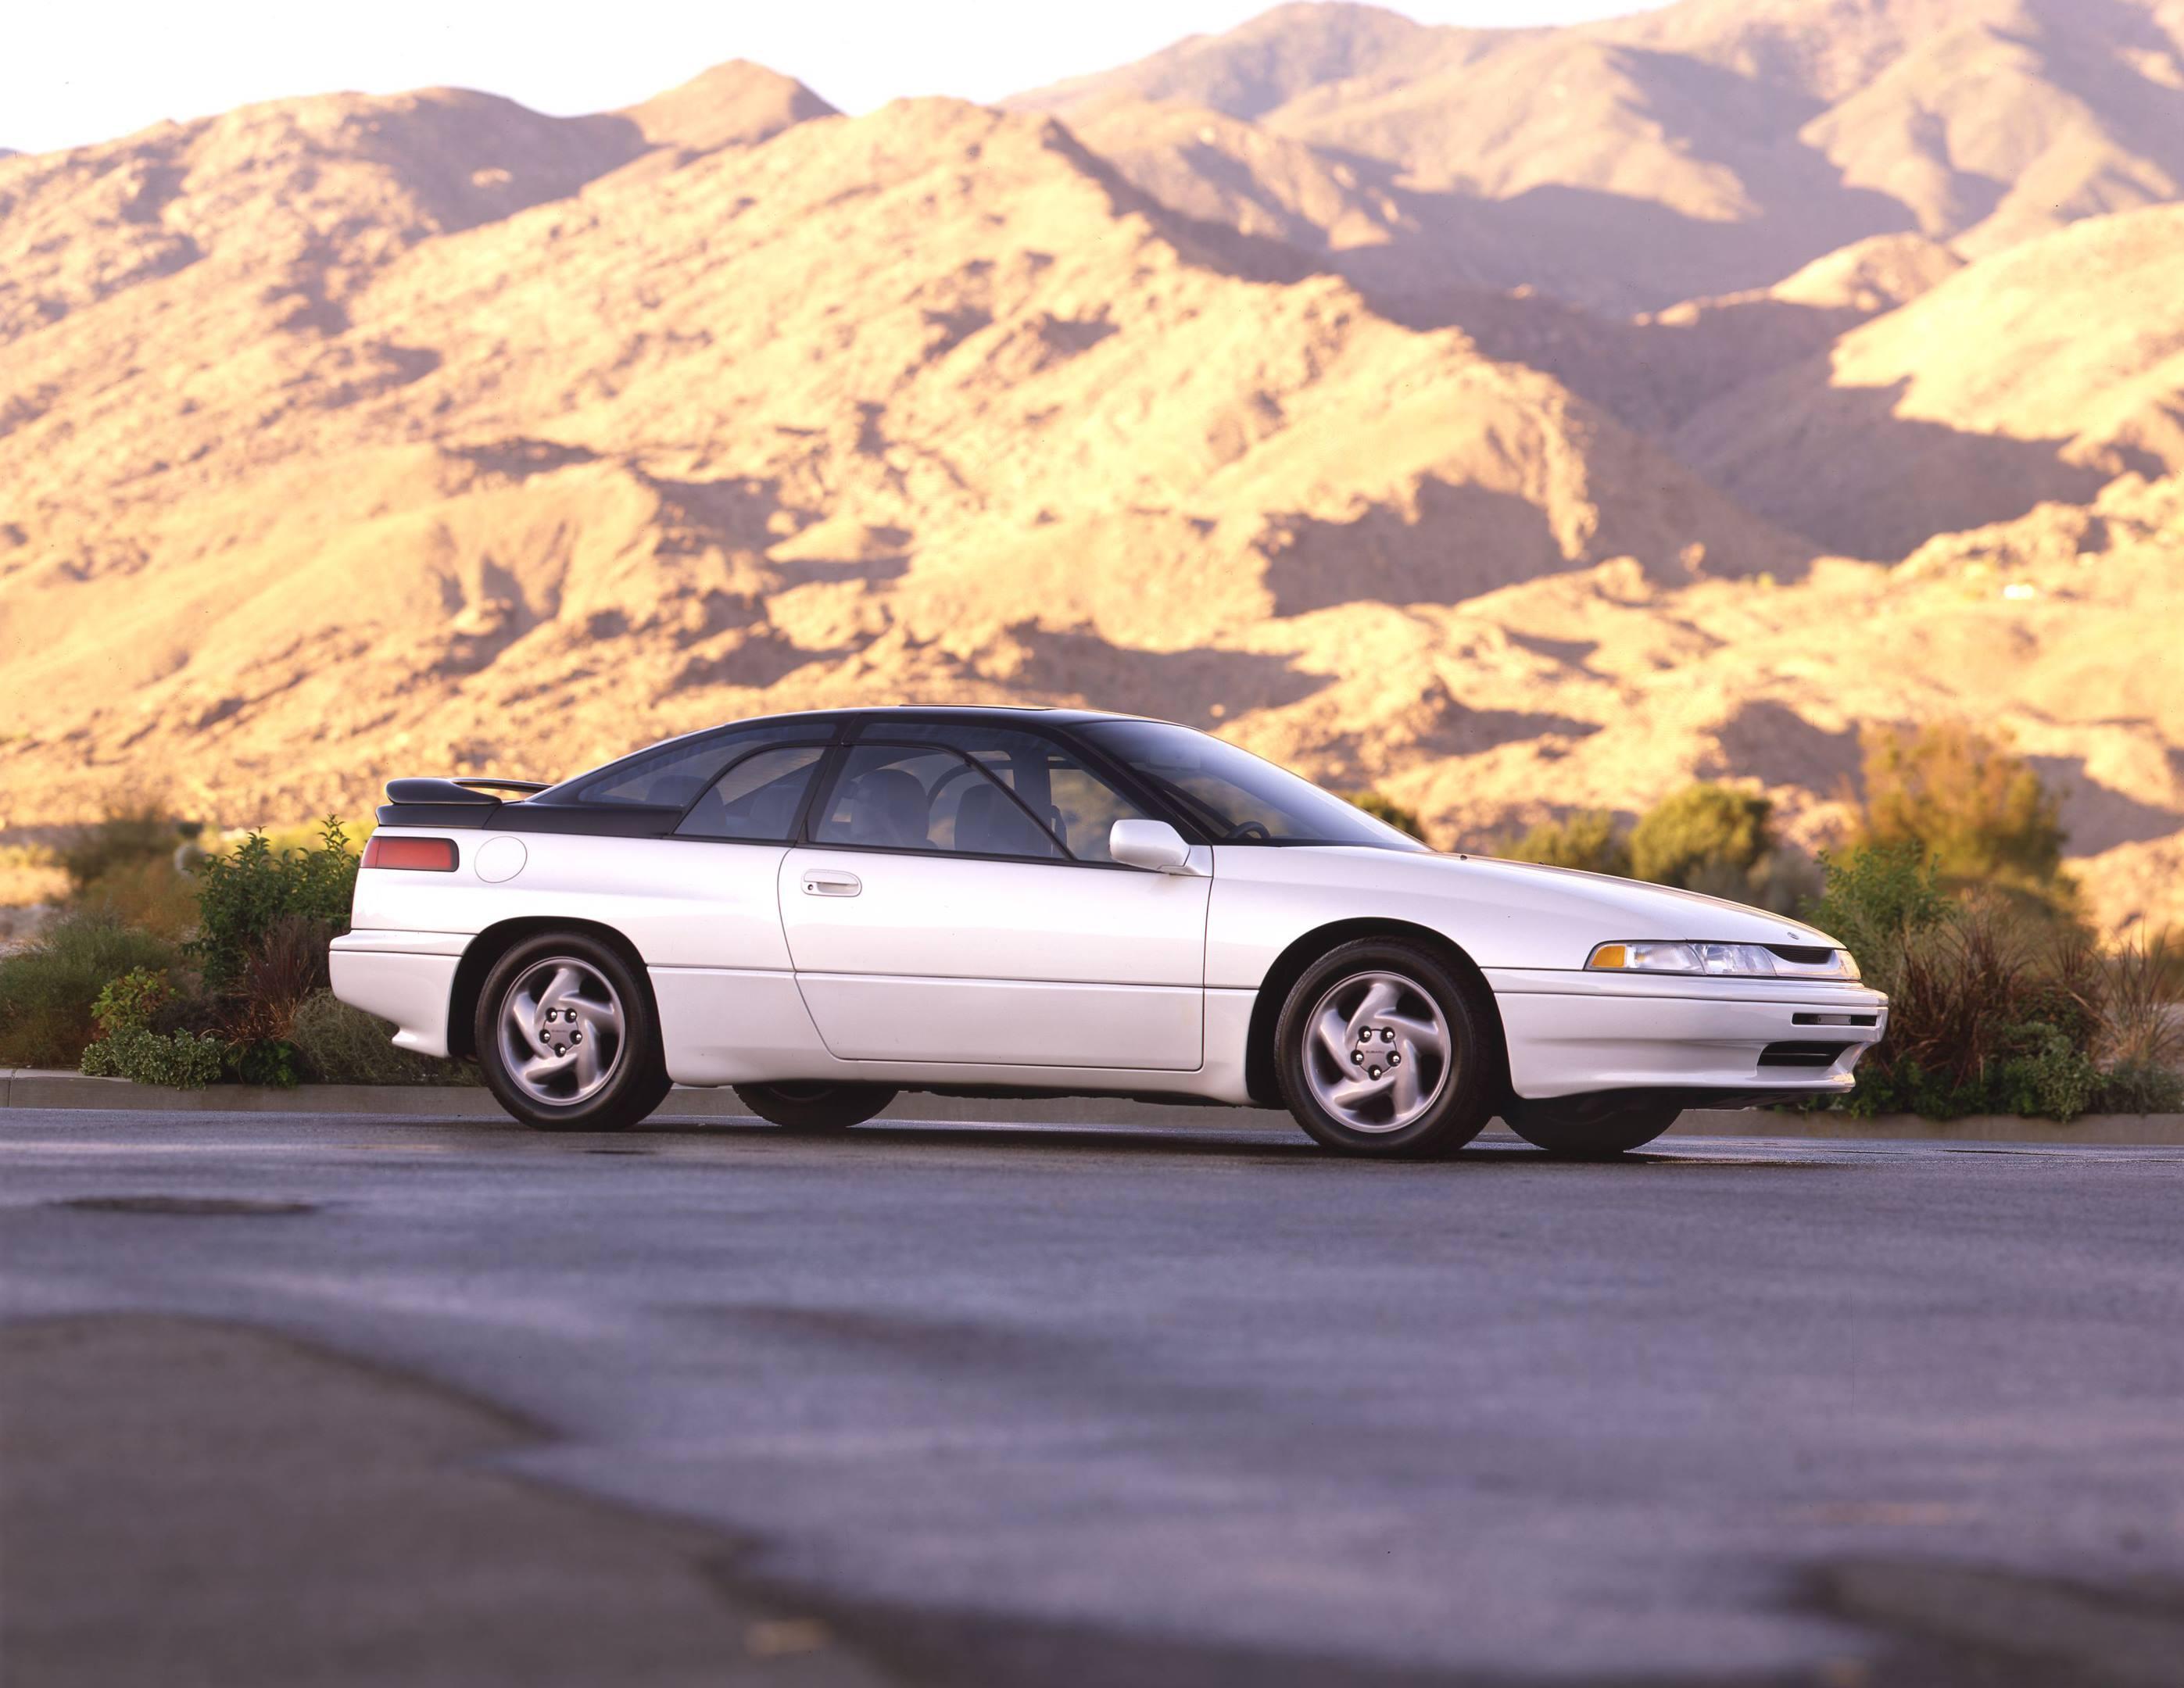 Subaru SVX white